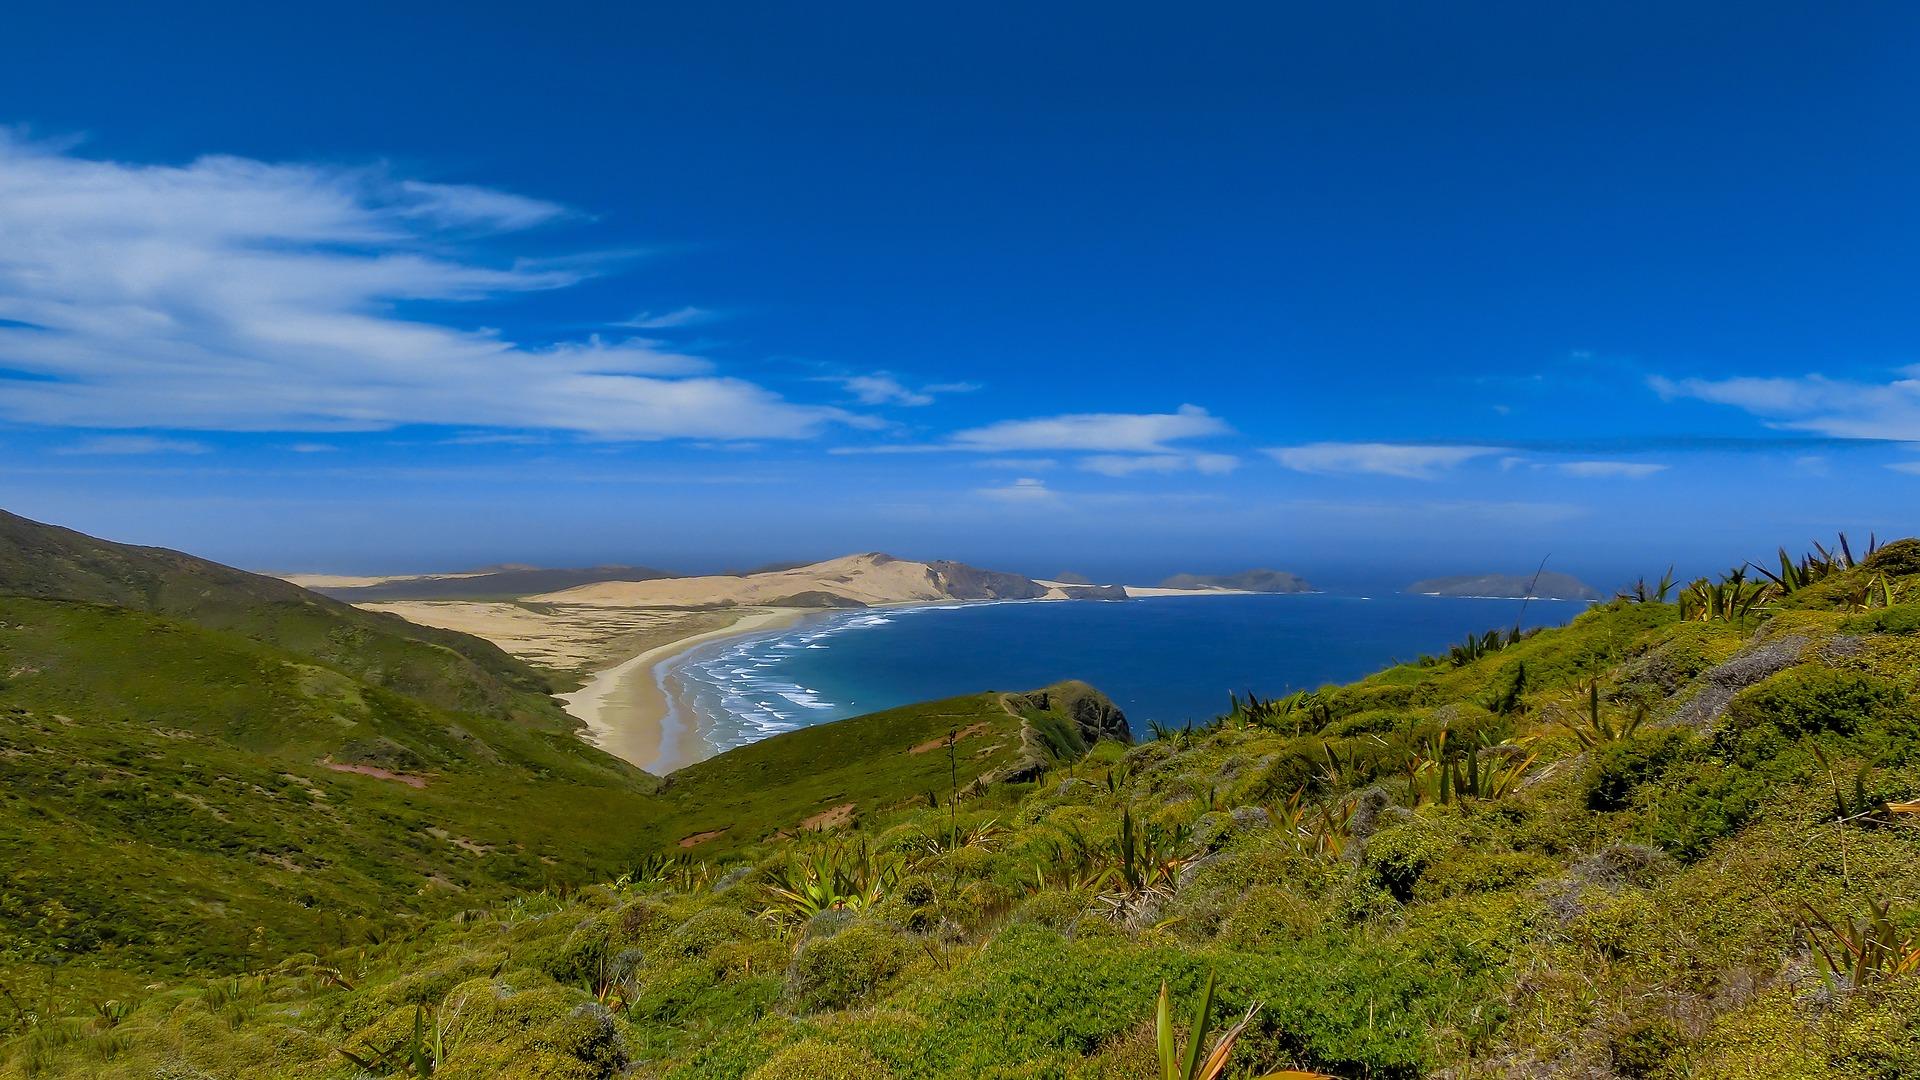 NEW ZEALAND NORTH ISLAND PHOTO GALLERY — travelwildnow.com